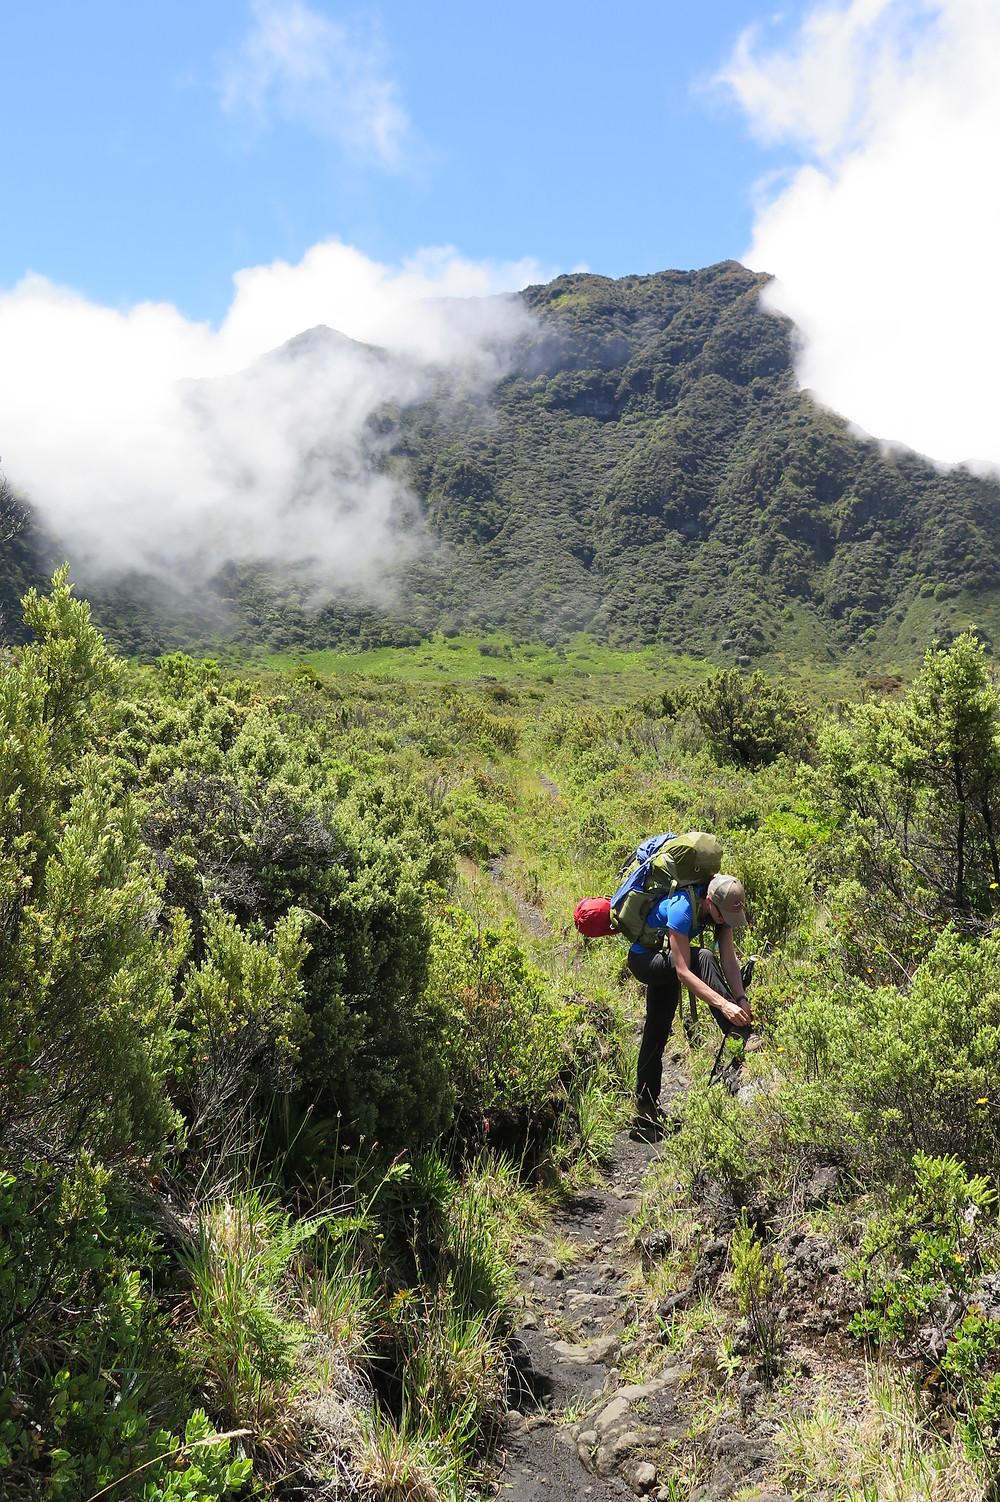 Back on the trail in Haleakalā National Park Crater